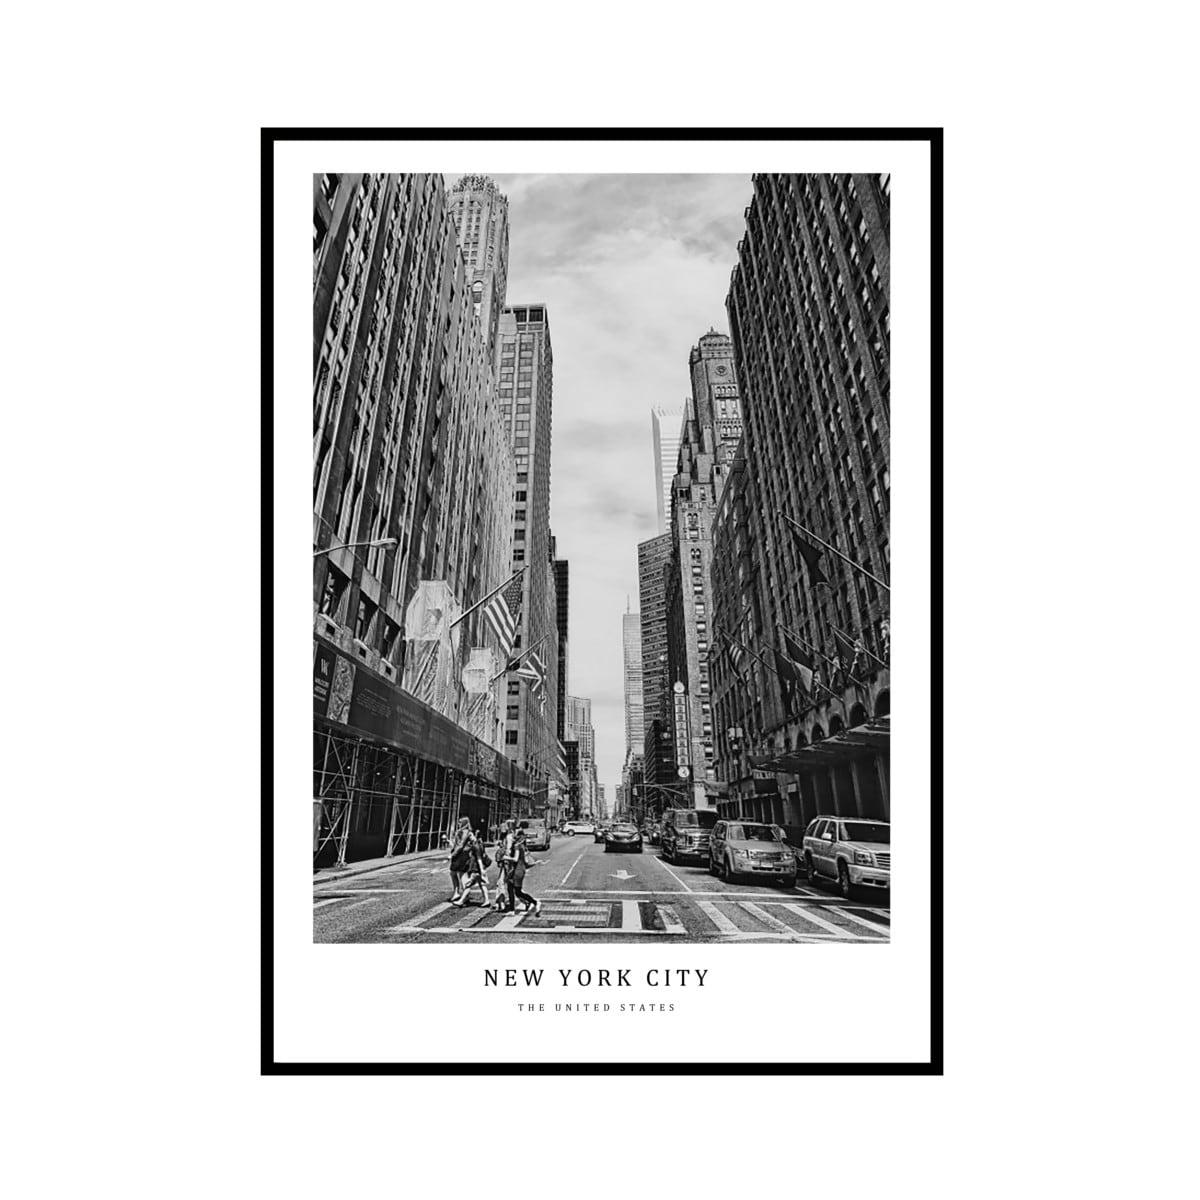 """NEW YORK CITY"" US - POSTER [SD-000593] A4サイズ ポスター単品"